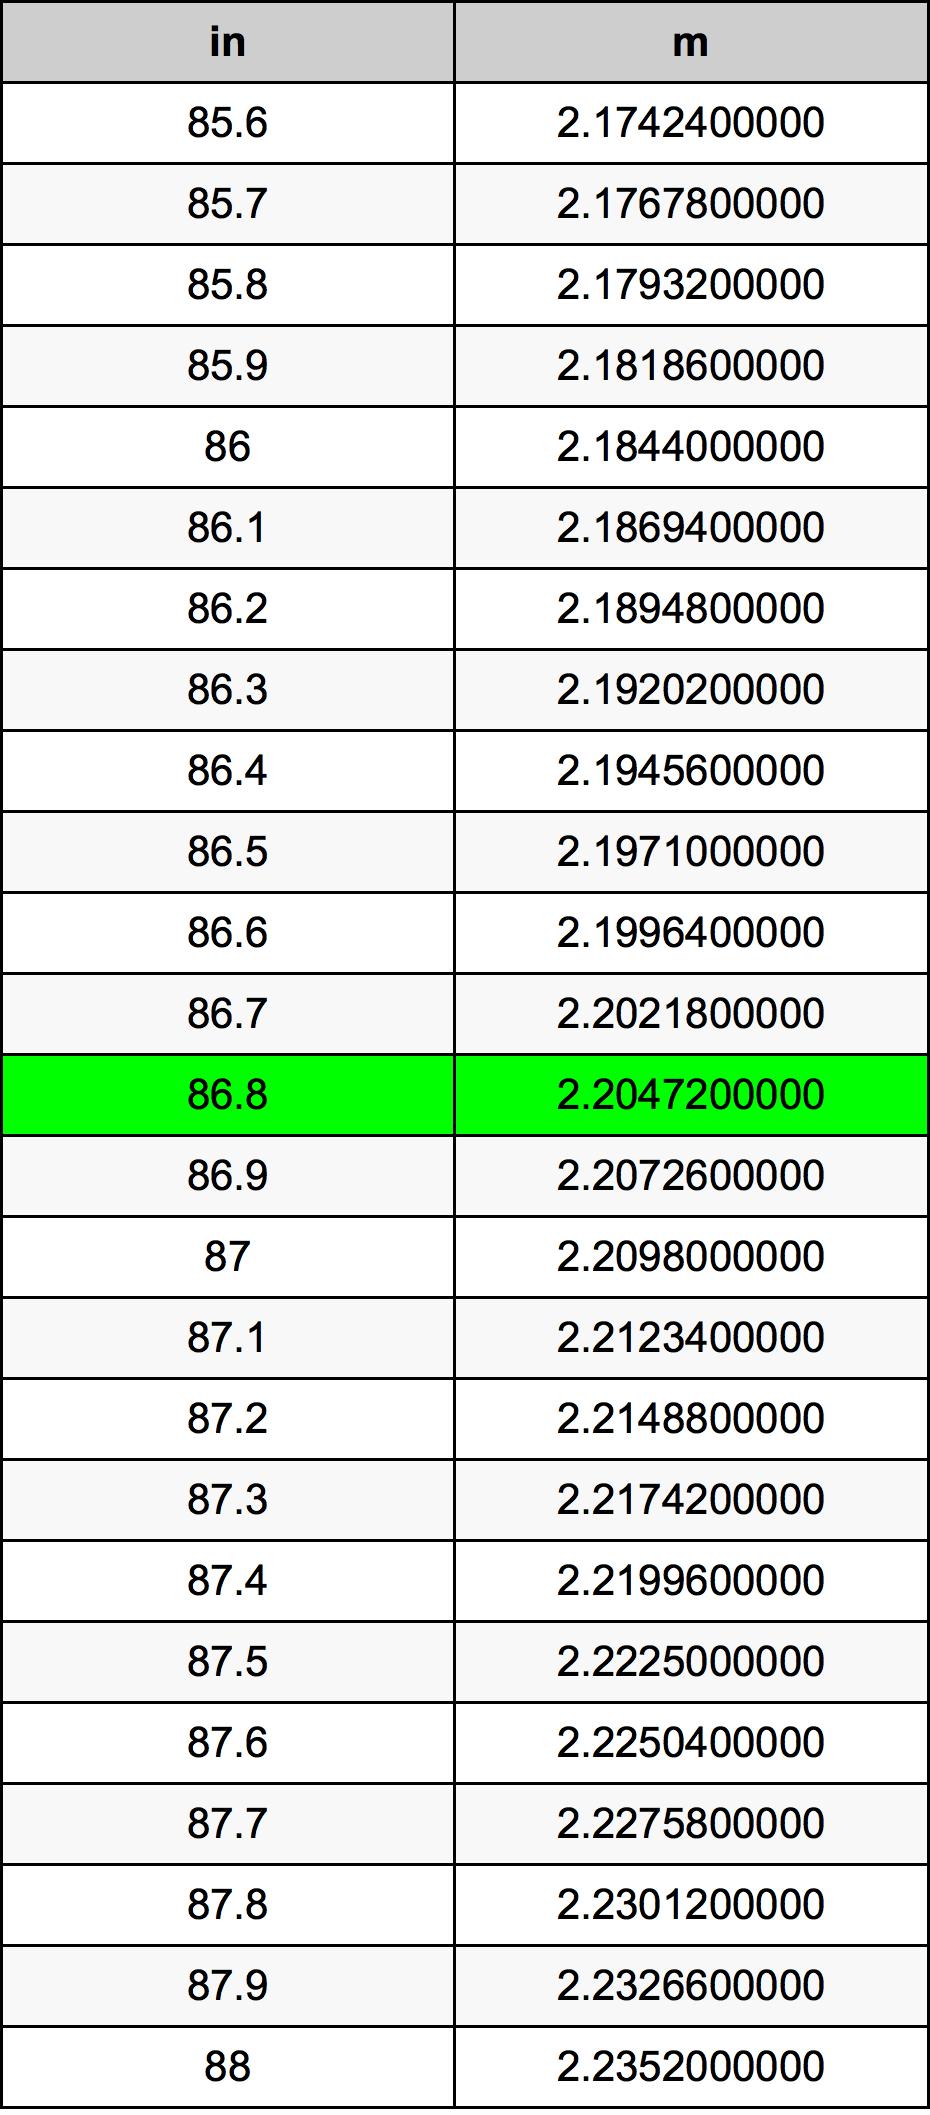 86.8 дюйм Таблица преобразования